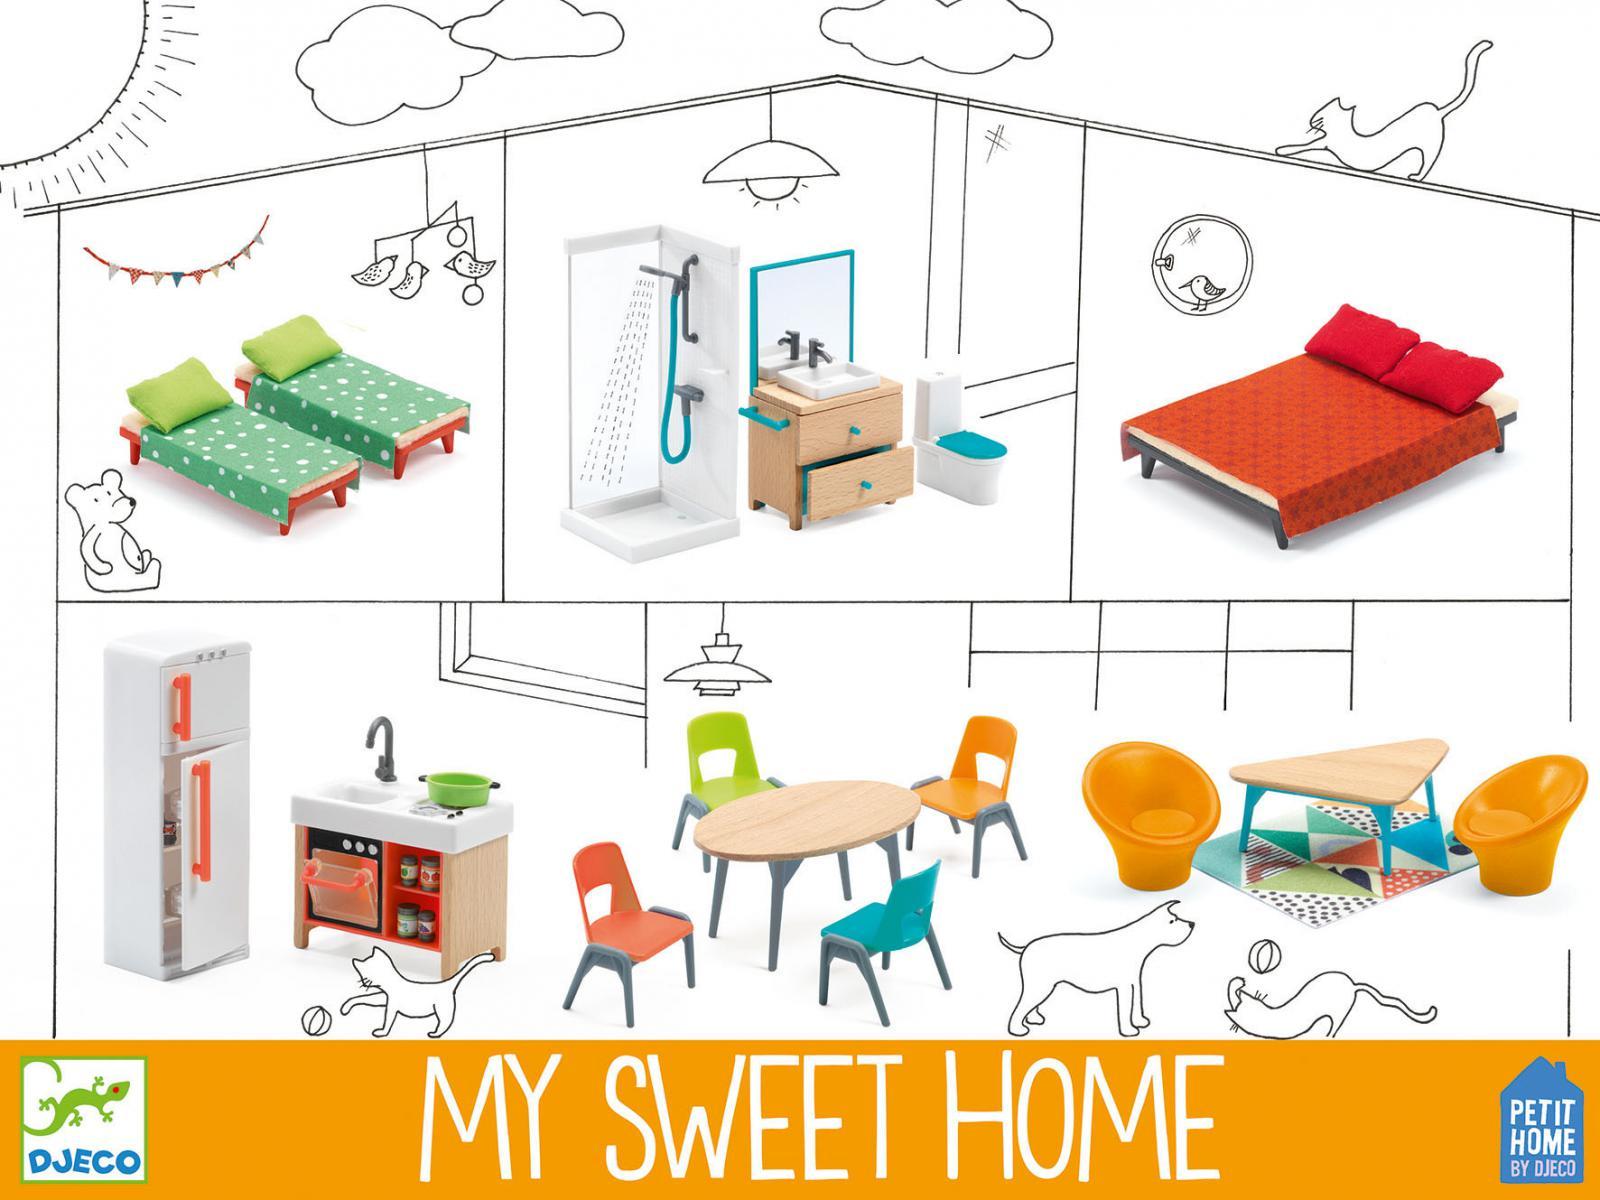 djeco my sweet home. Black Bedroom Furniture Sets. Home Design Ideas